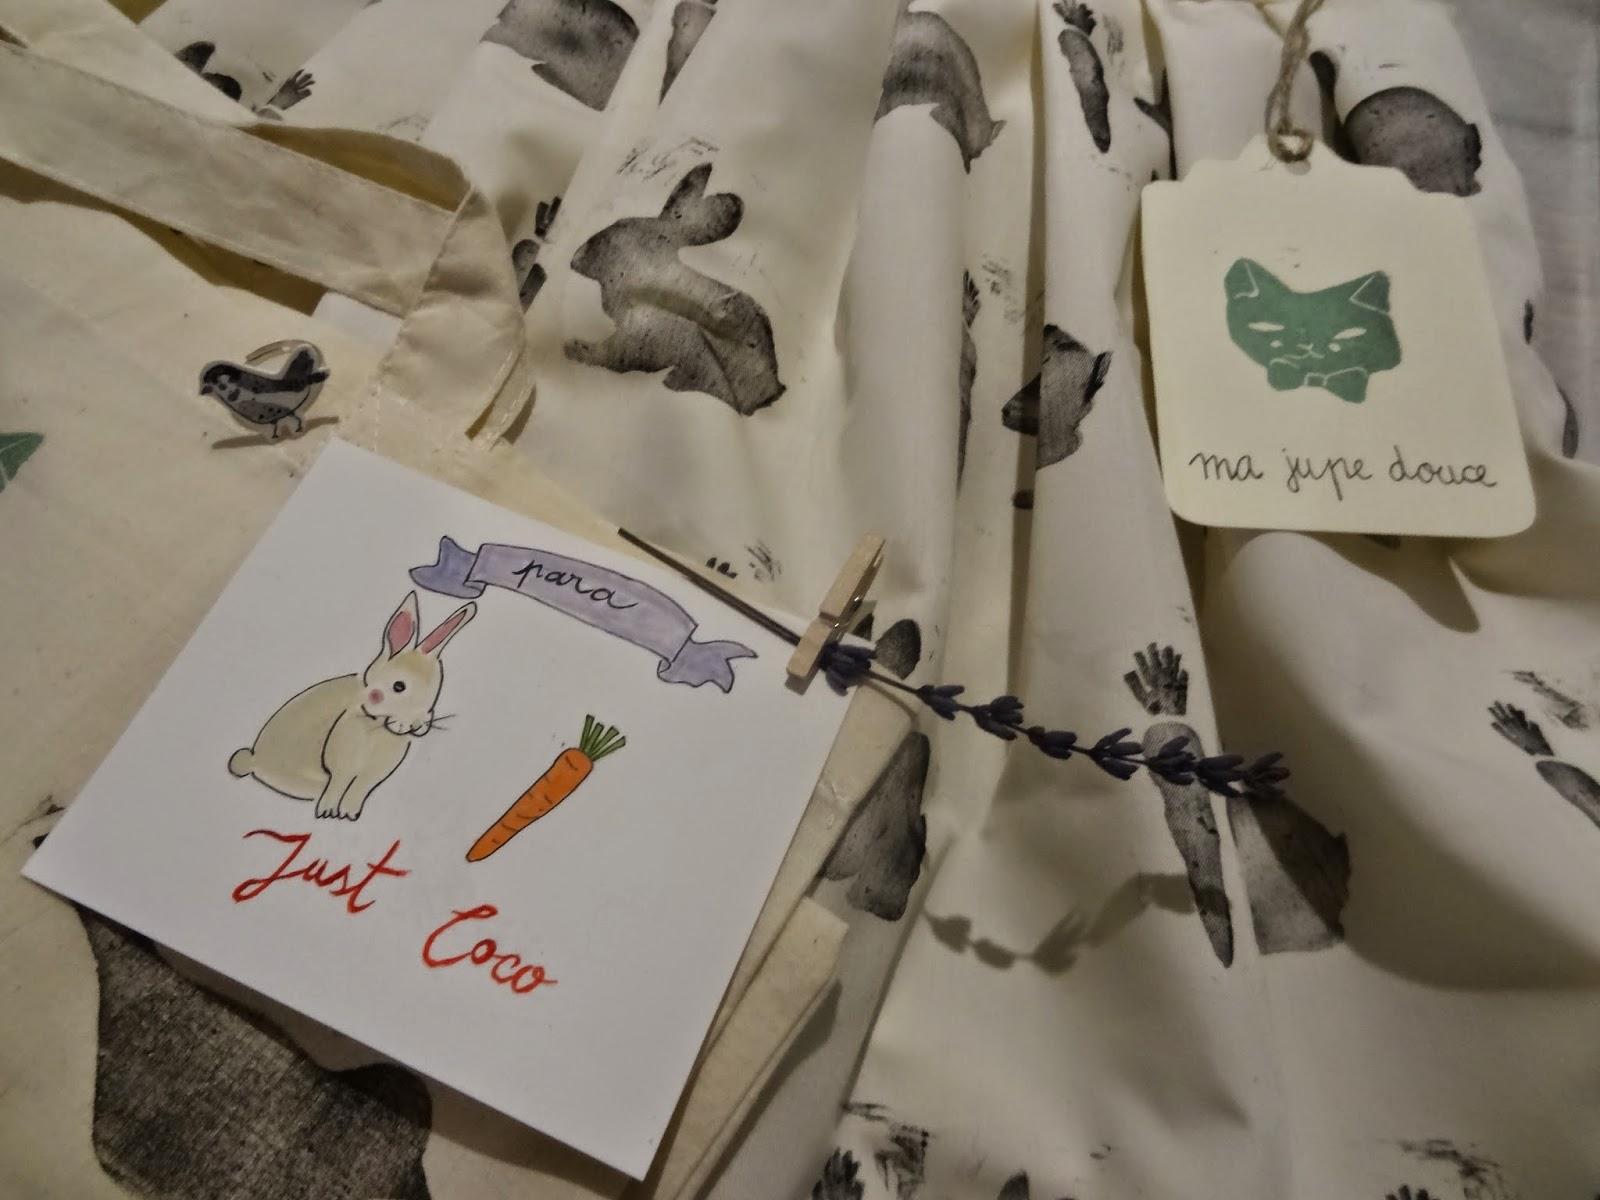 packing embalaje tags tarjetas etiquetas handmade hecho a mano rabbits carrot lavender lavanda